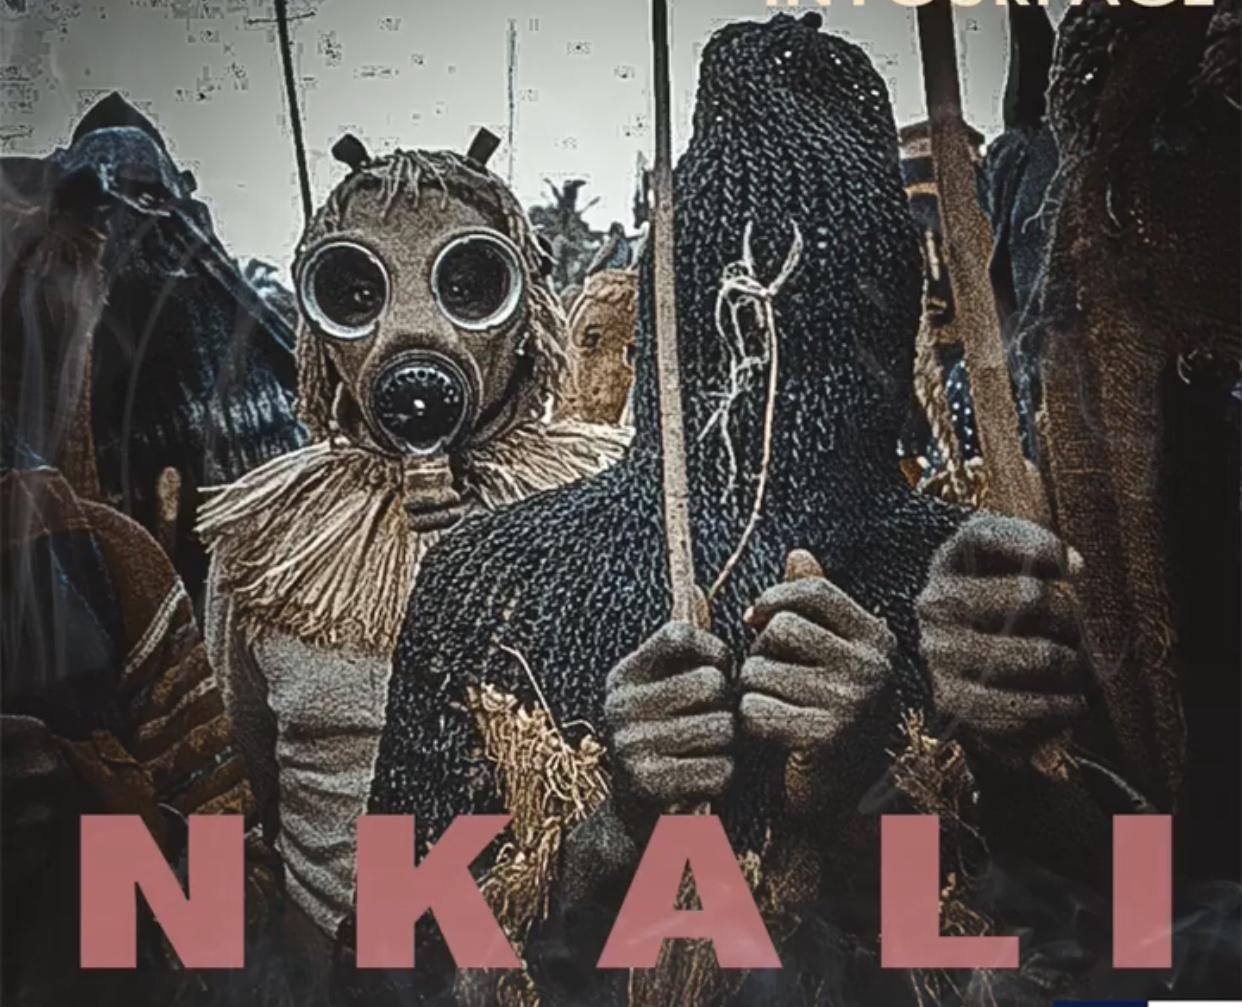 6-new-nigerian-songs-to-kickstart-your-week